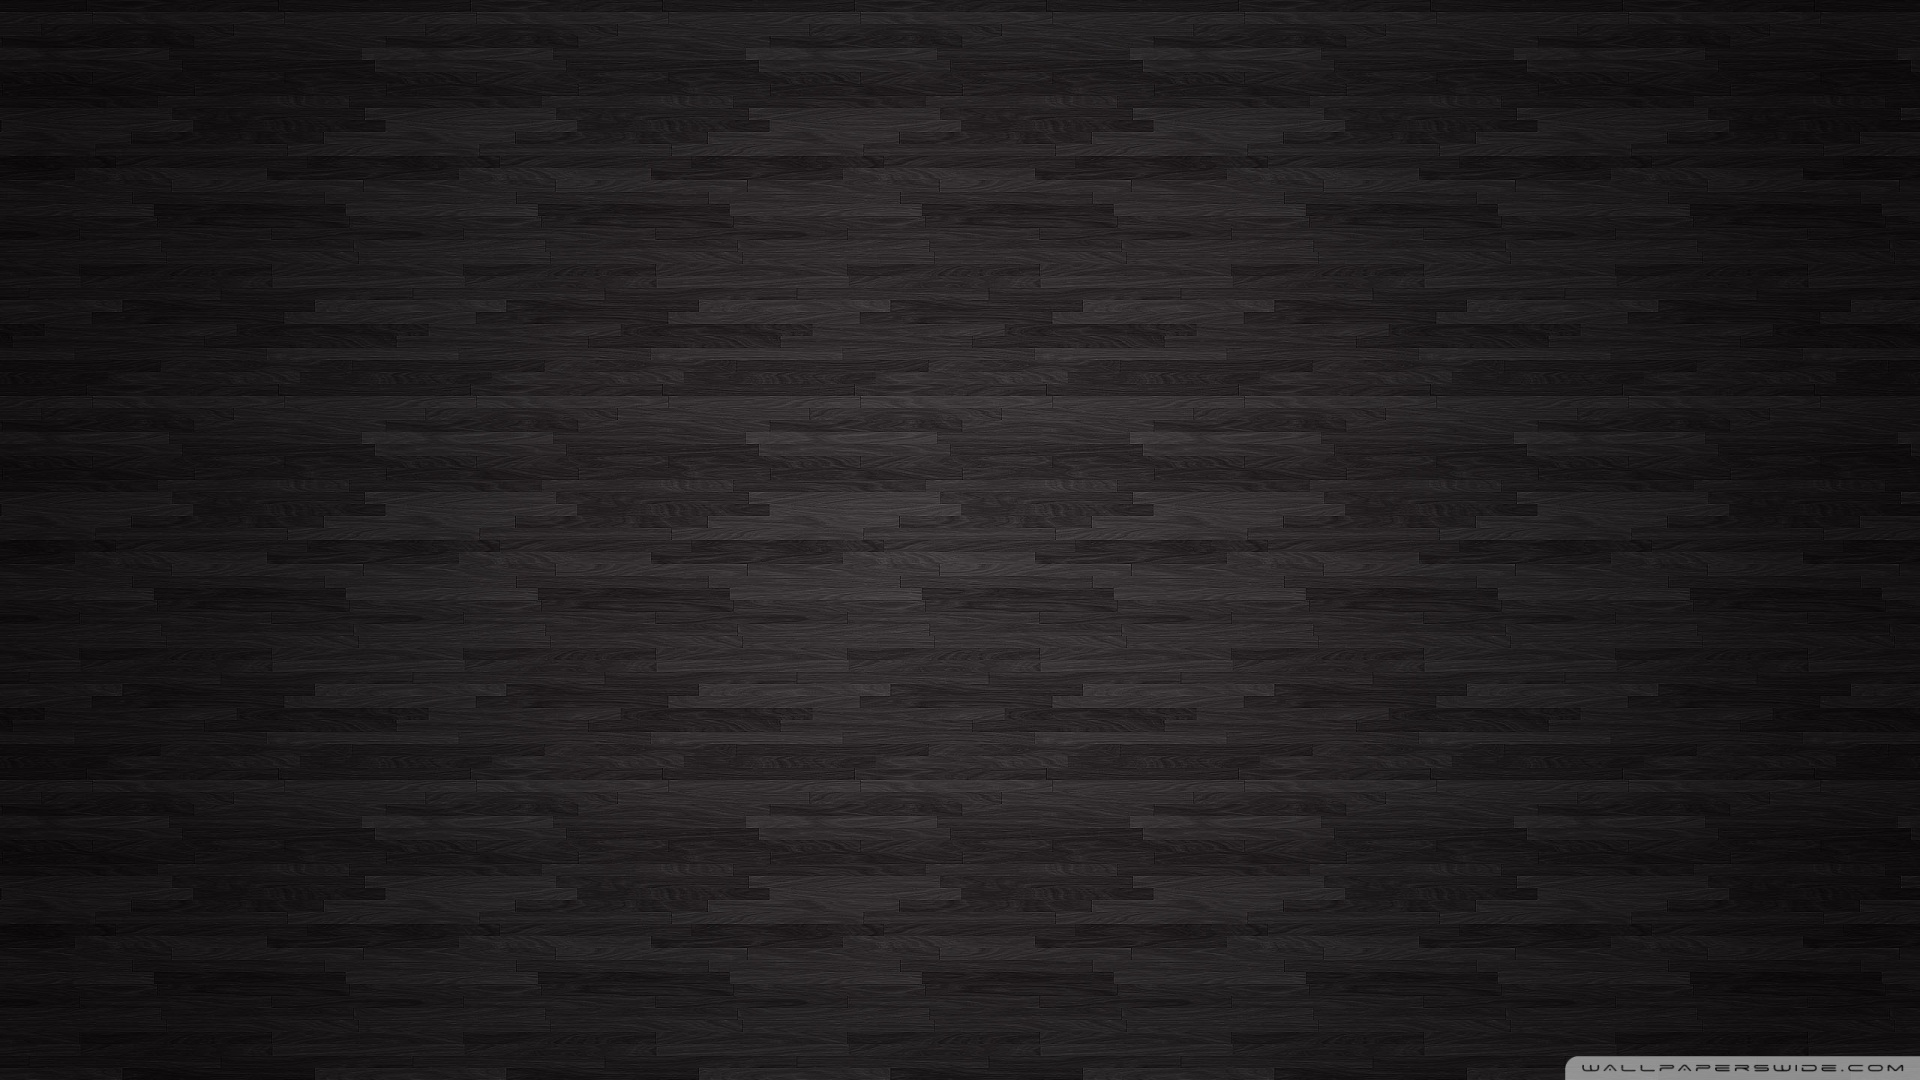 2048x1152 Youtube wallpapers HD   475609 1920x1080